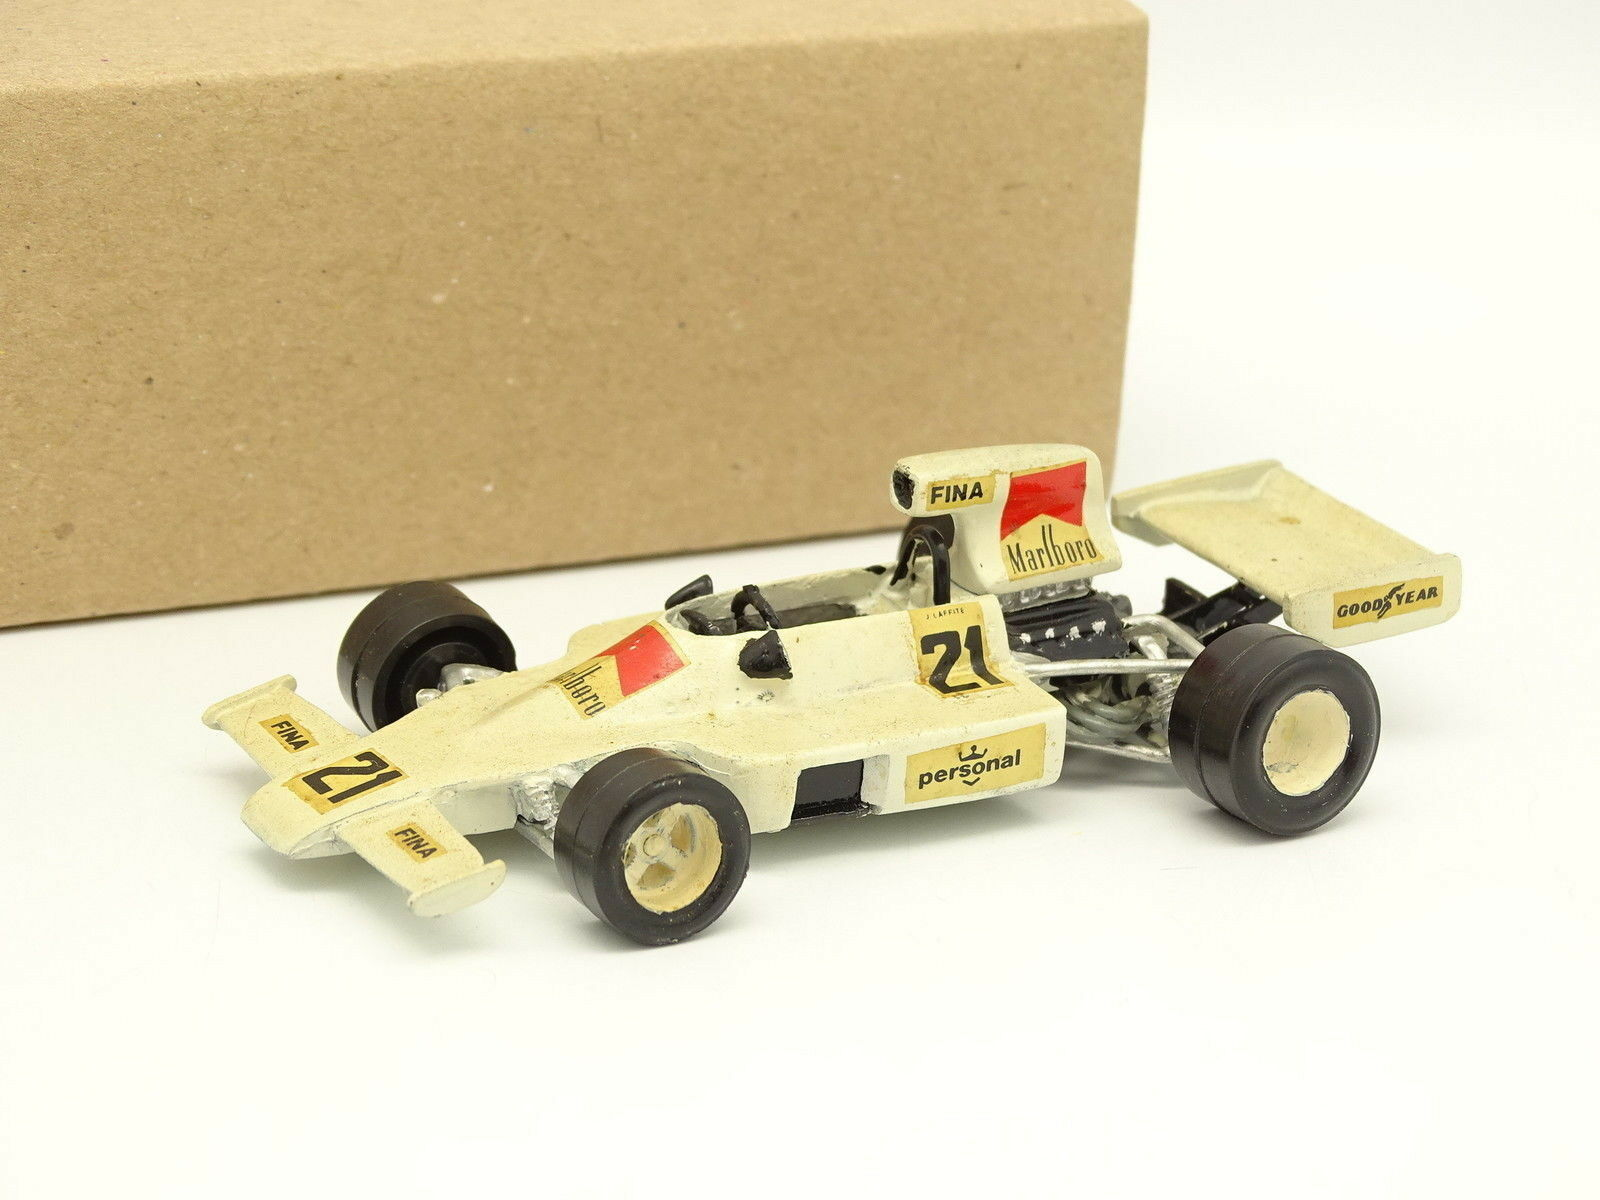 John Day Kit Metal Montado 1 43 - F1 Williams Fw02 - Gp de Brasil 1975 Laffite